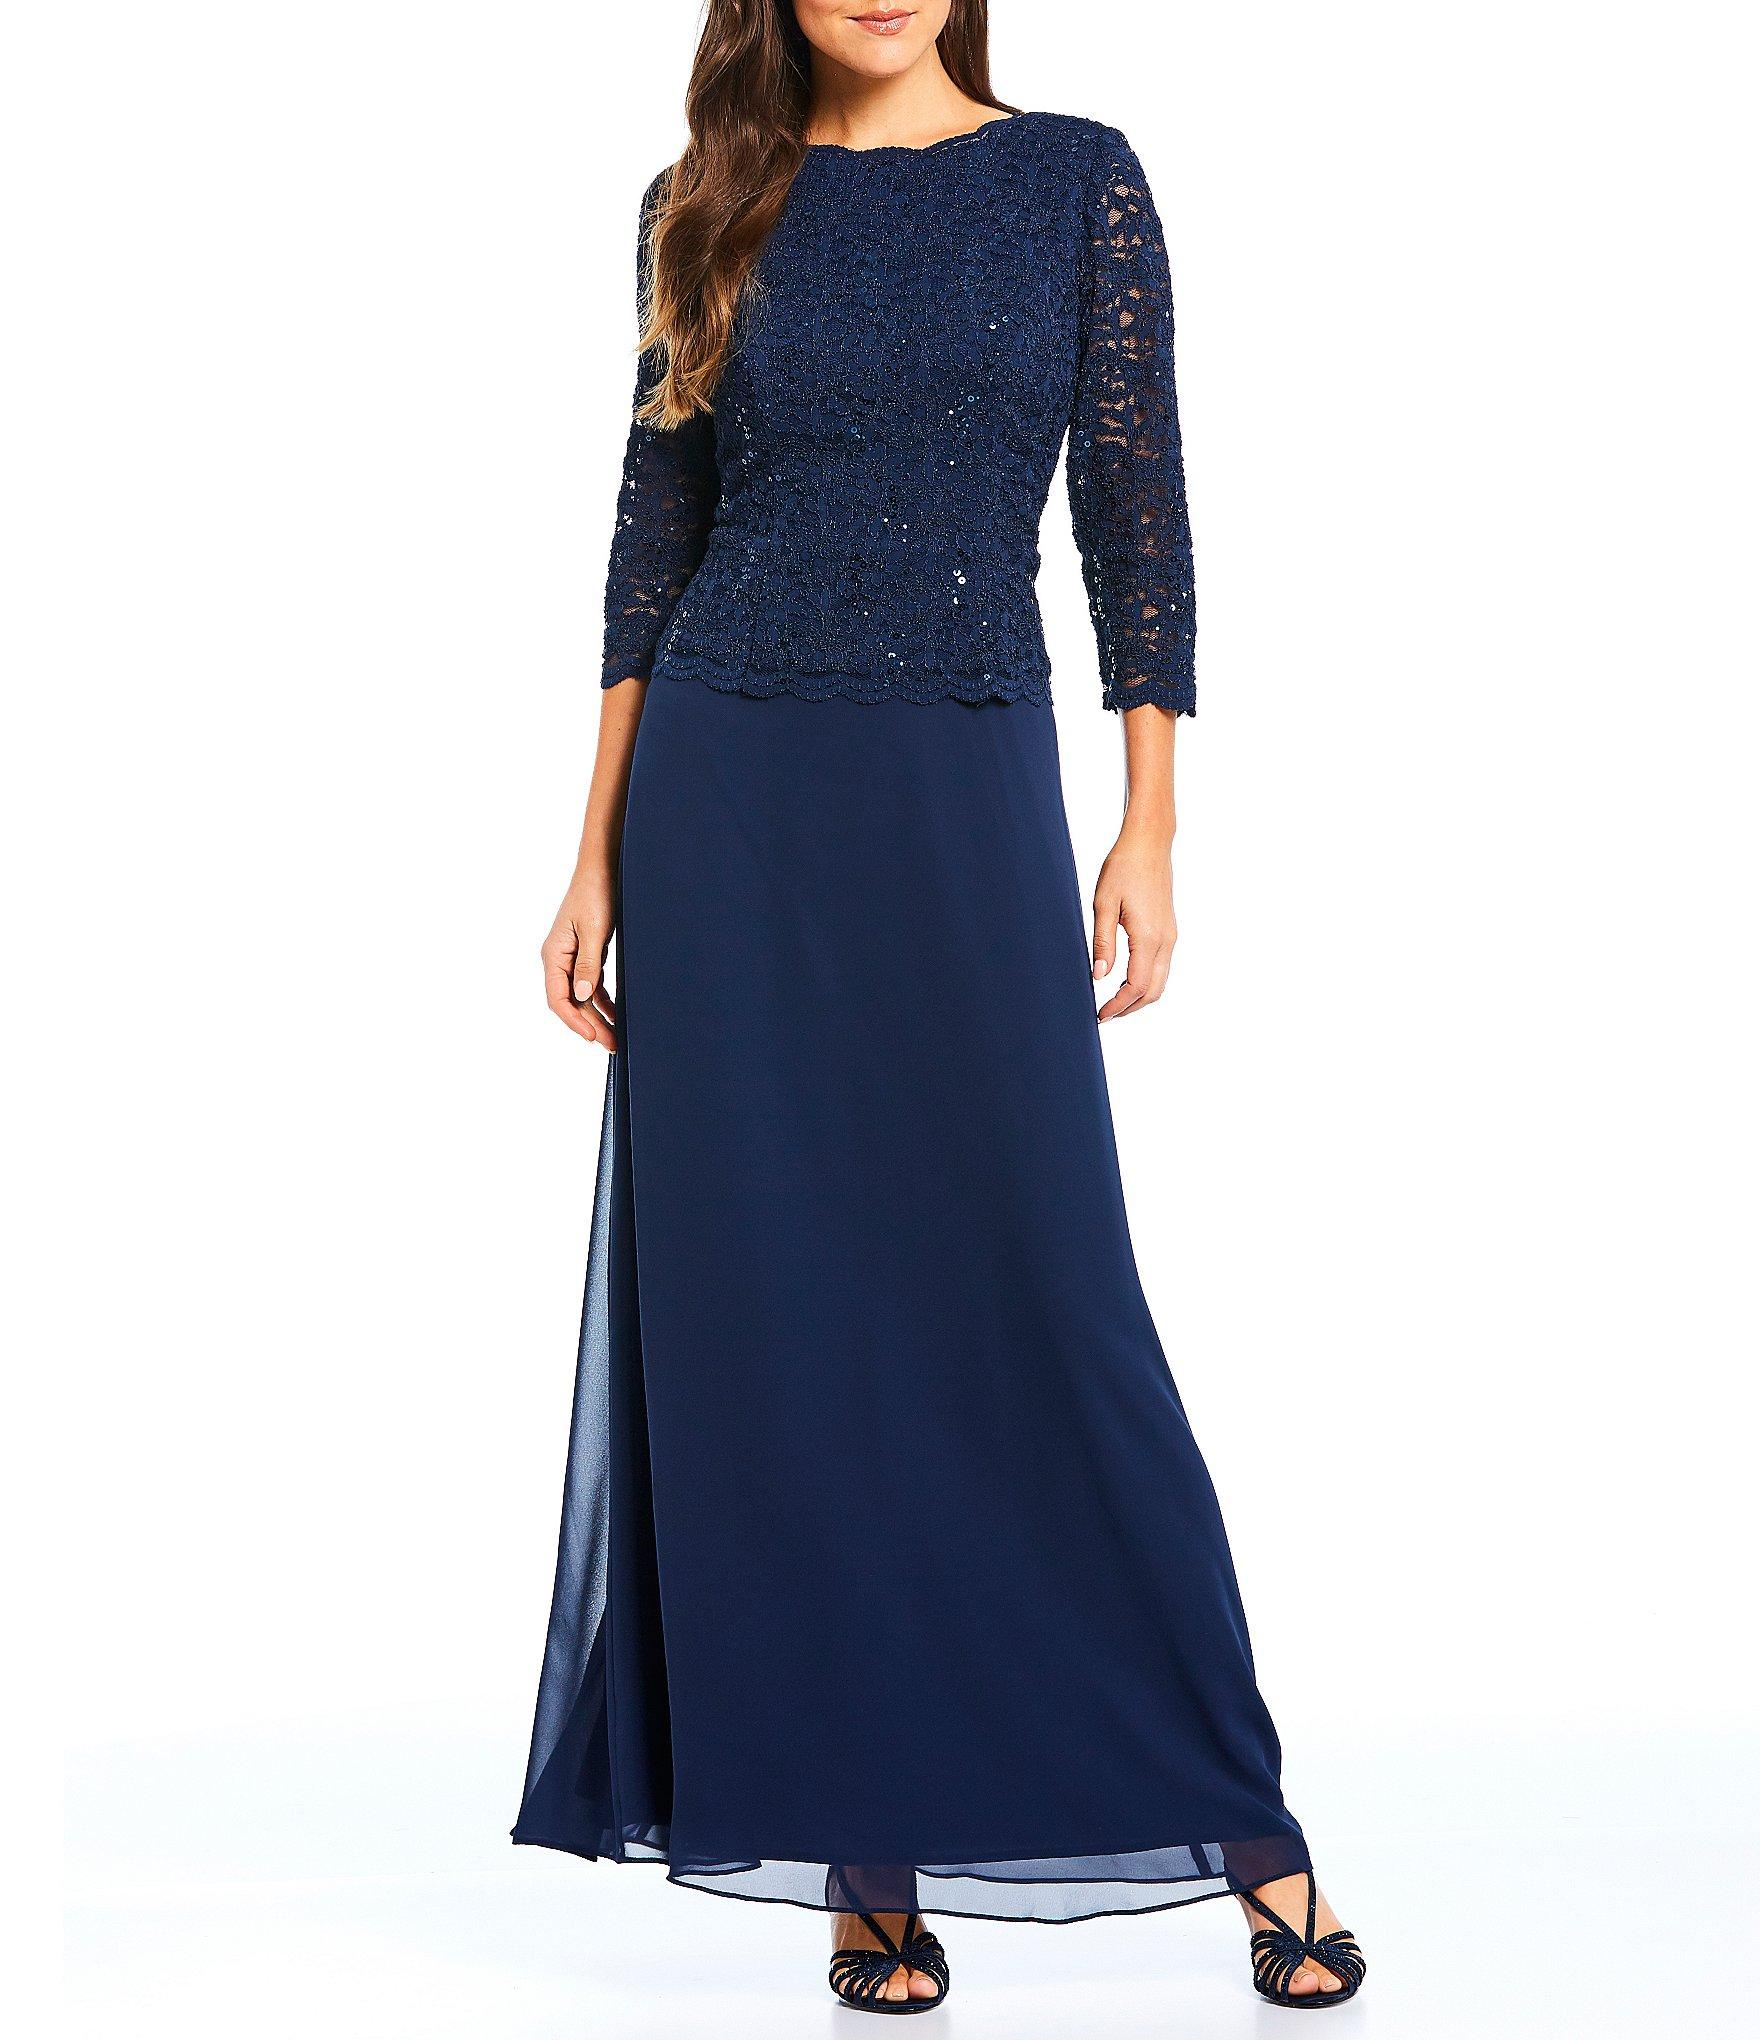 Navy Short Sleeved Lace Dress Womens Dresses Gowns Dillards